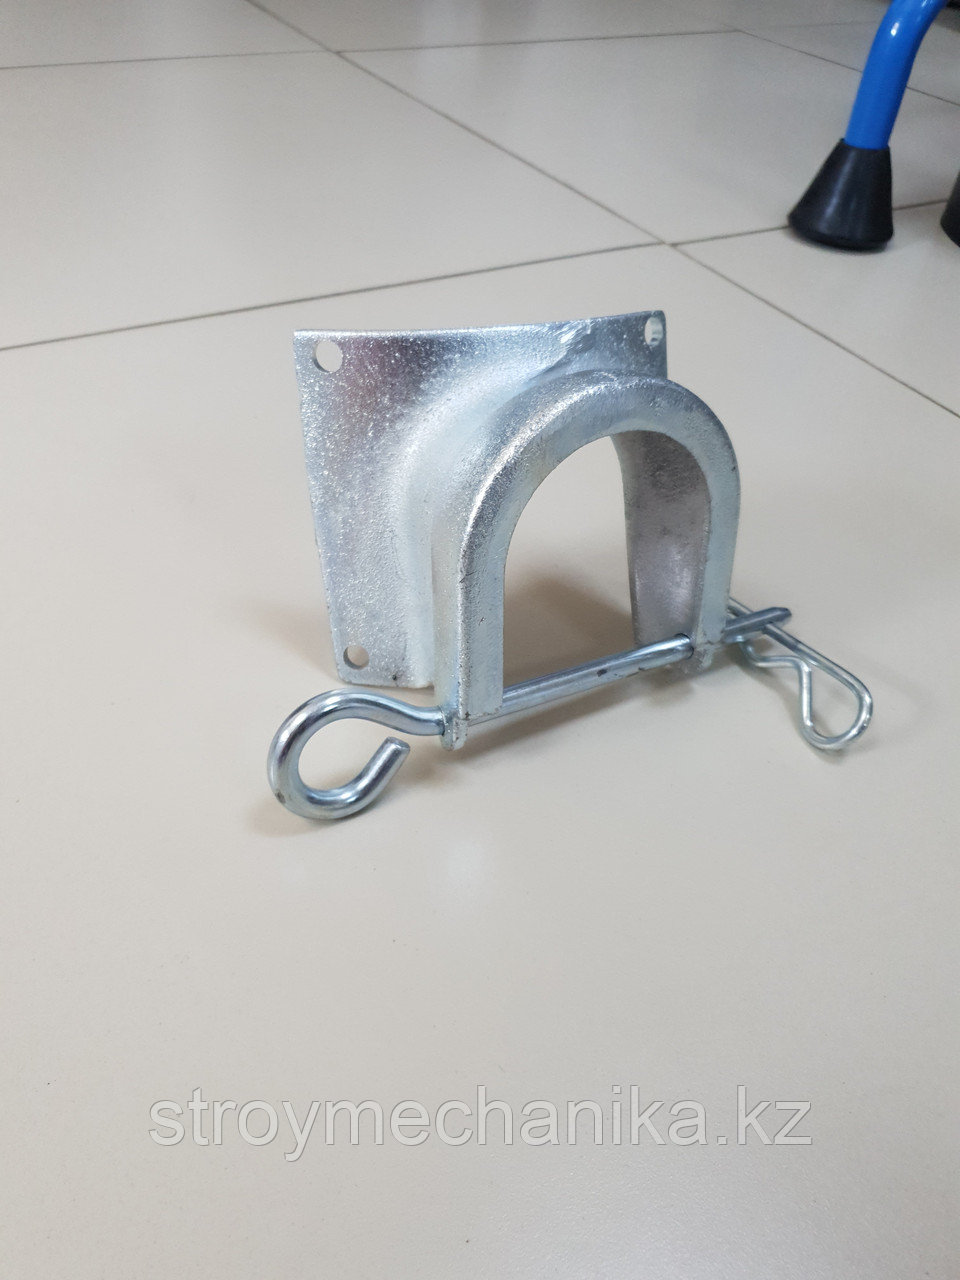 Маска ( адаптер ) гасителя для пневмонагнетателя д.65 мм.